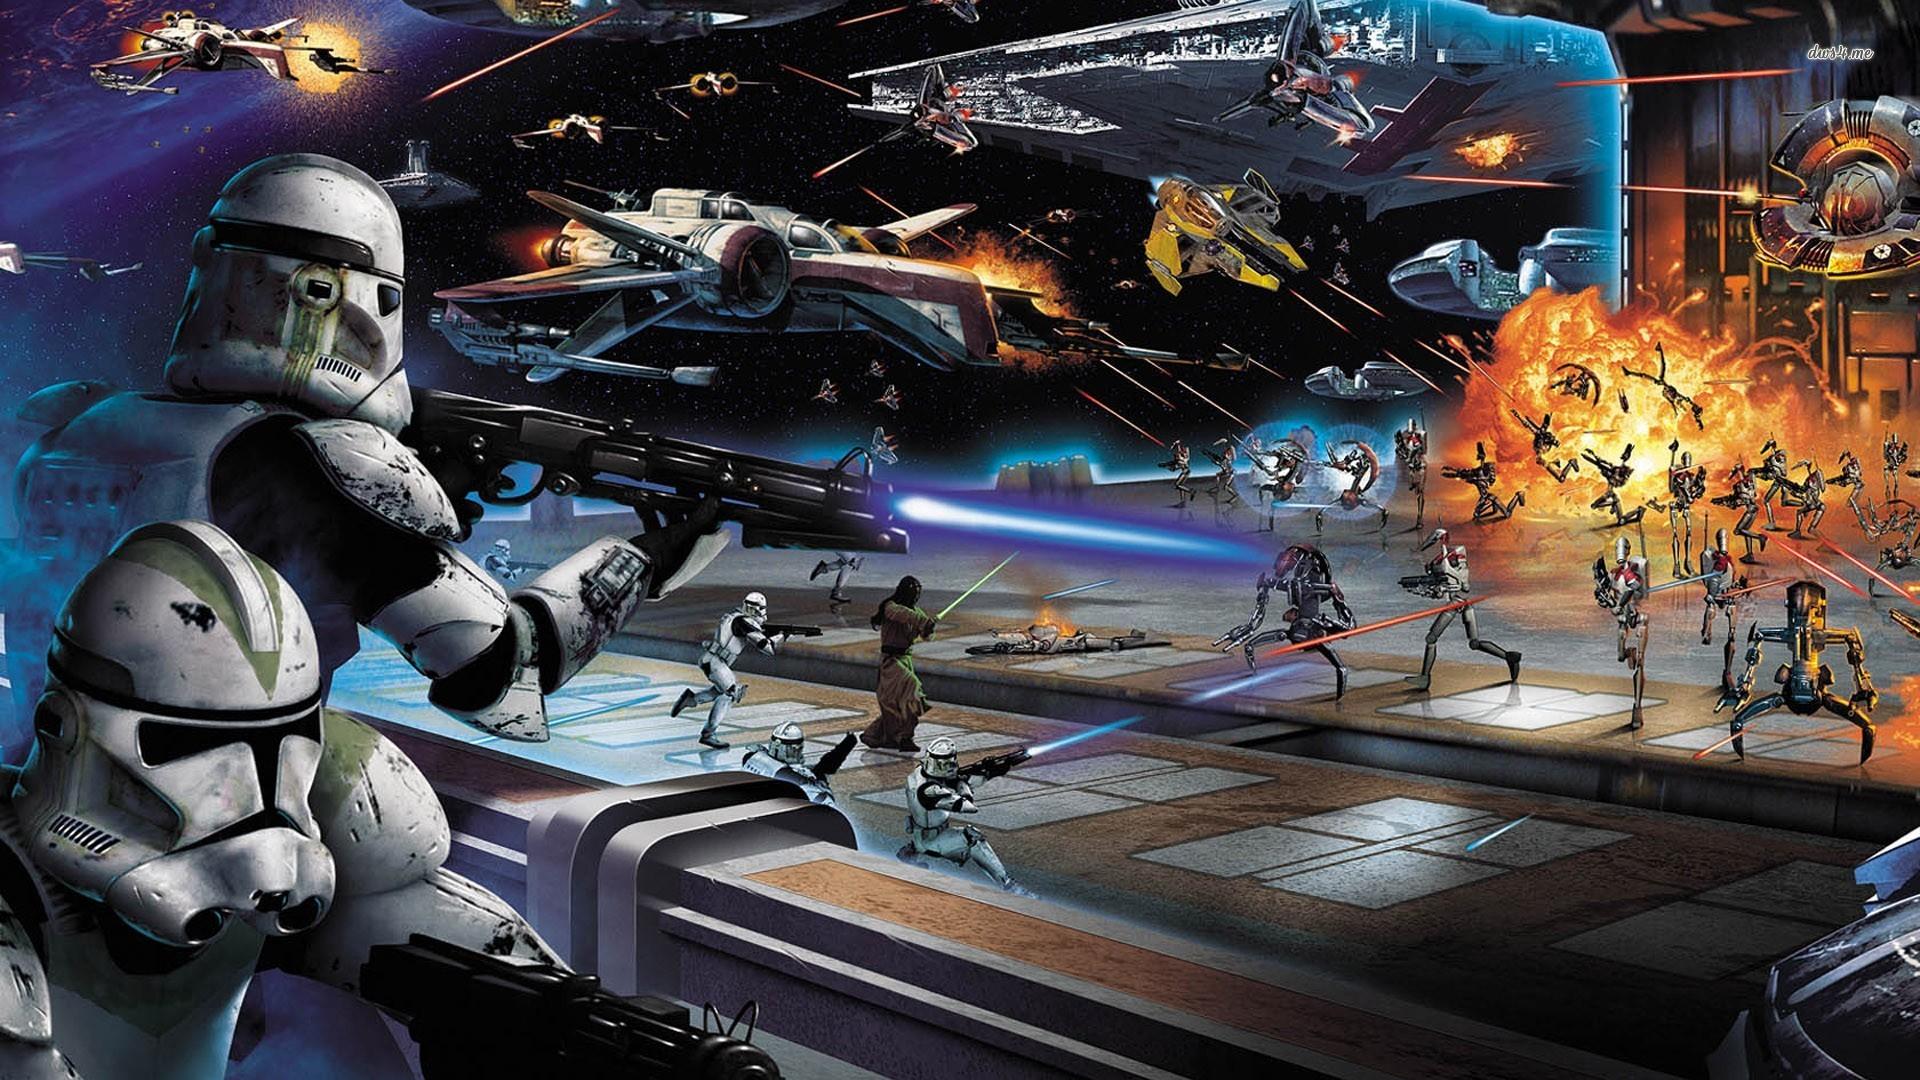 Wallpaper Star Wars Hd Gratuit 224 T 233 L 233 Charger Sur Ngn Mag